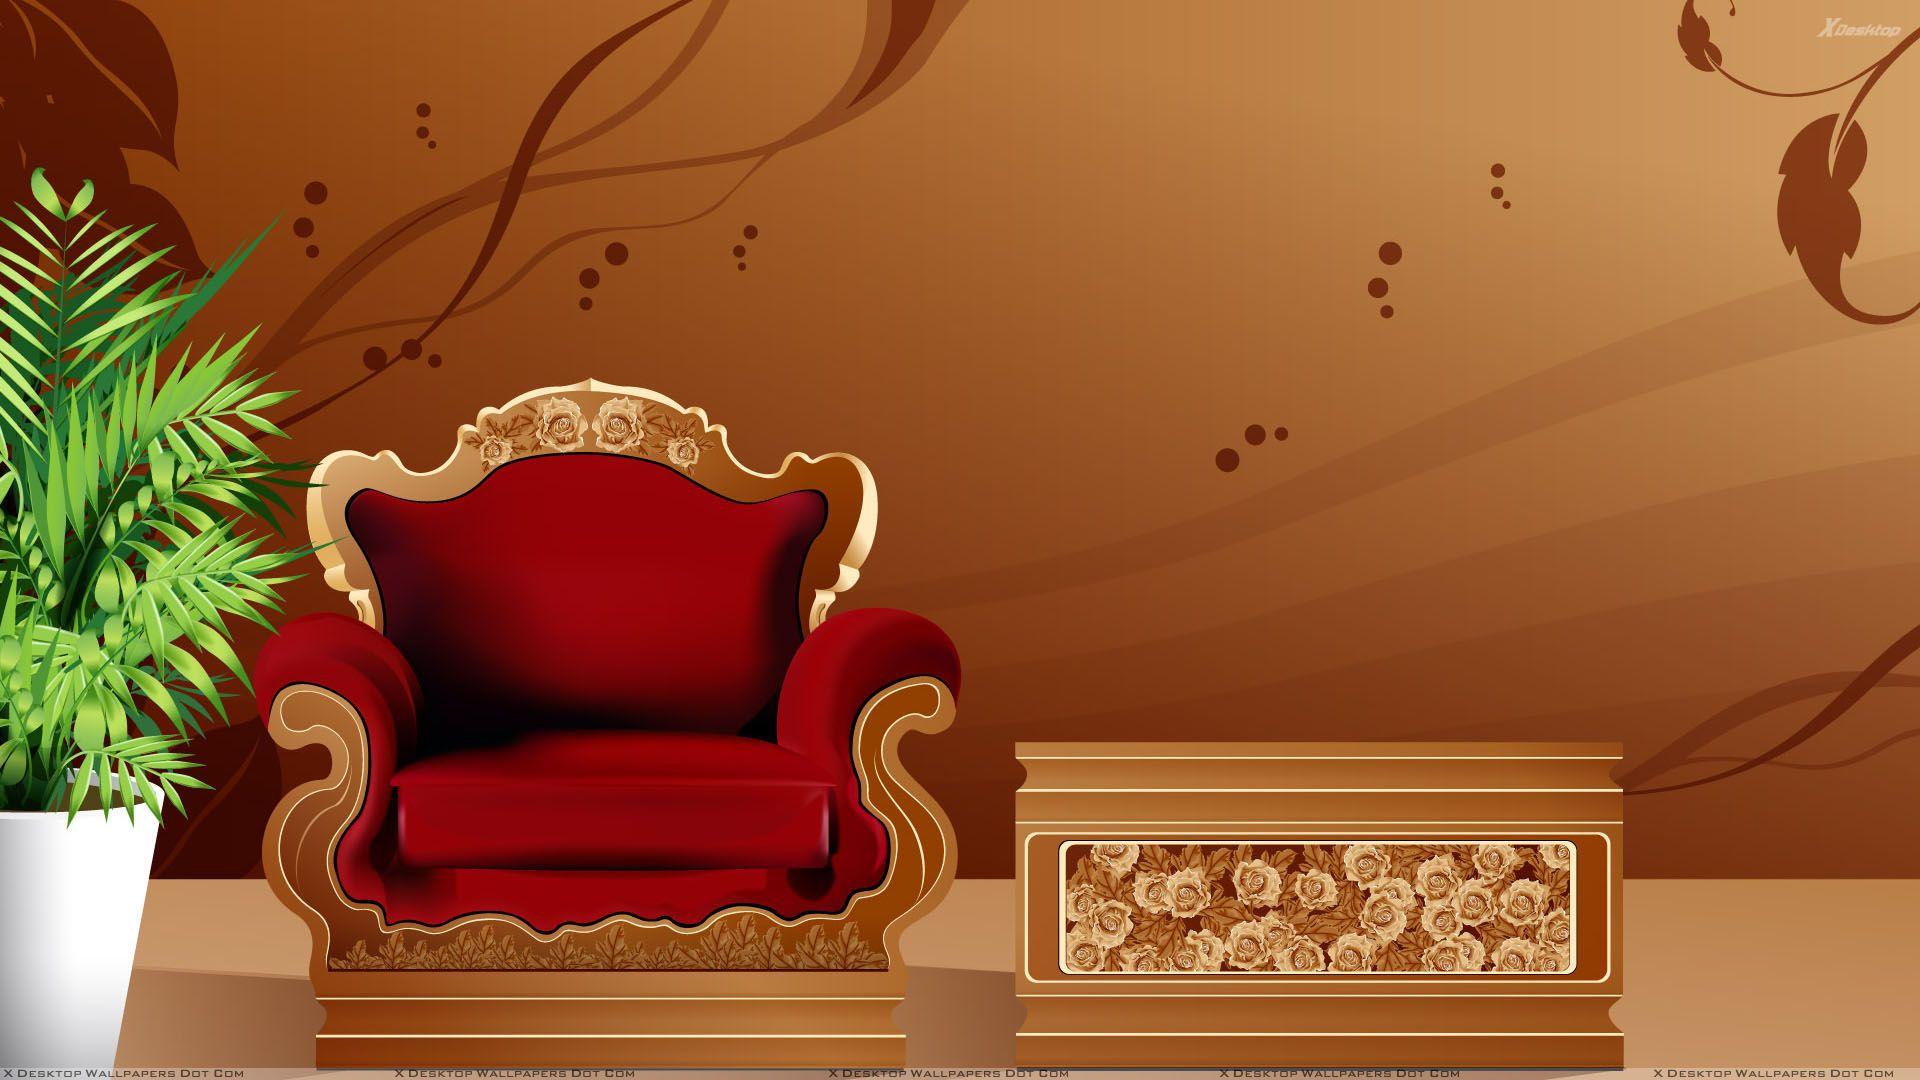 Furniture wallpaper photo